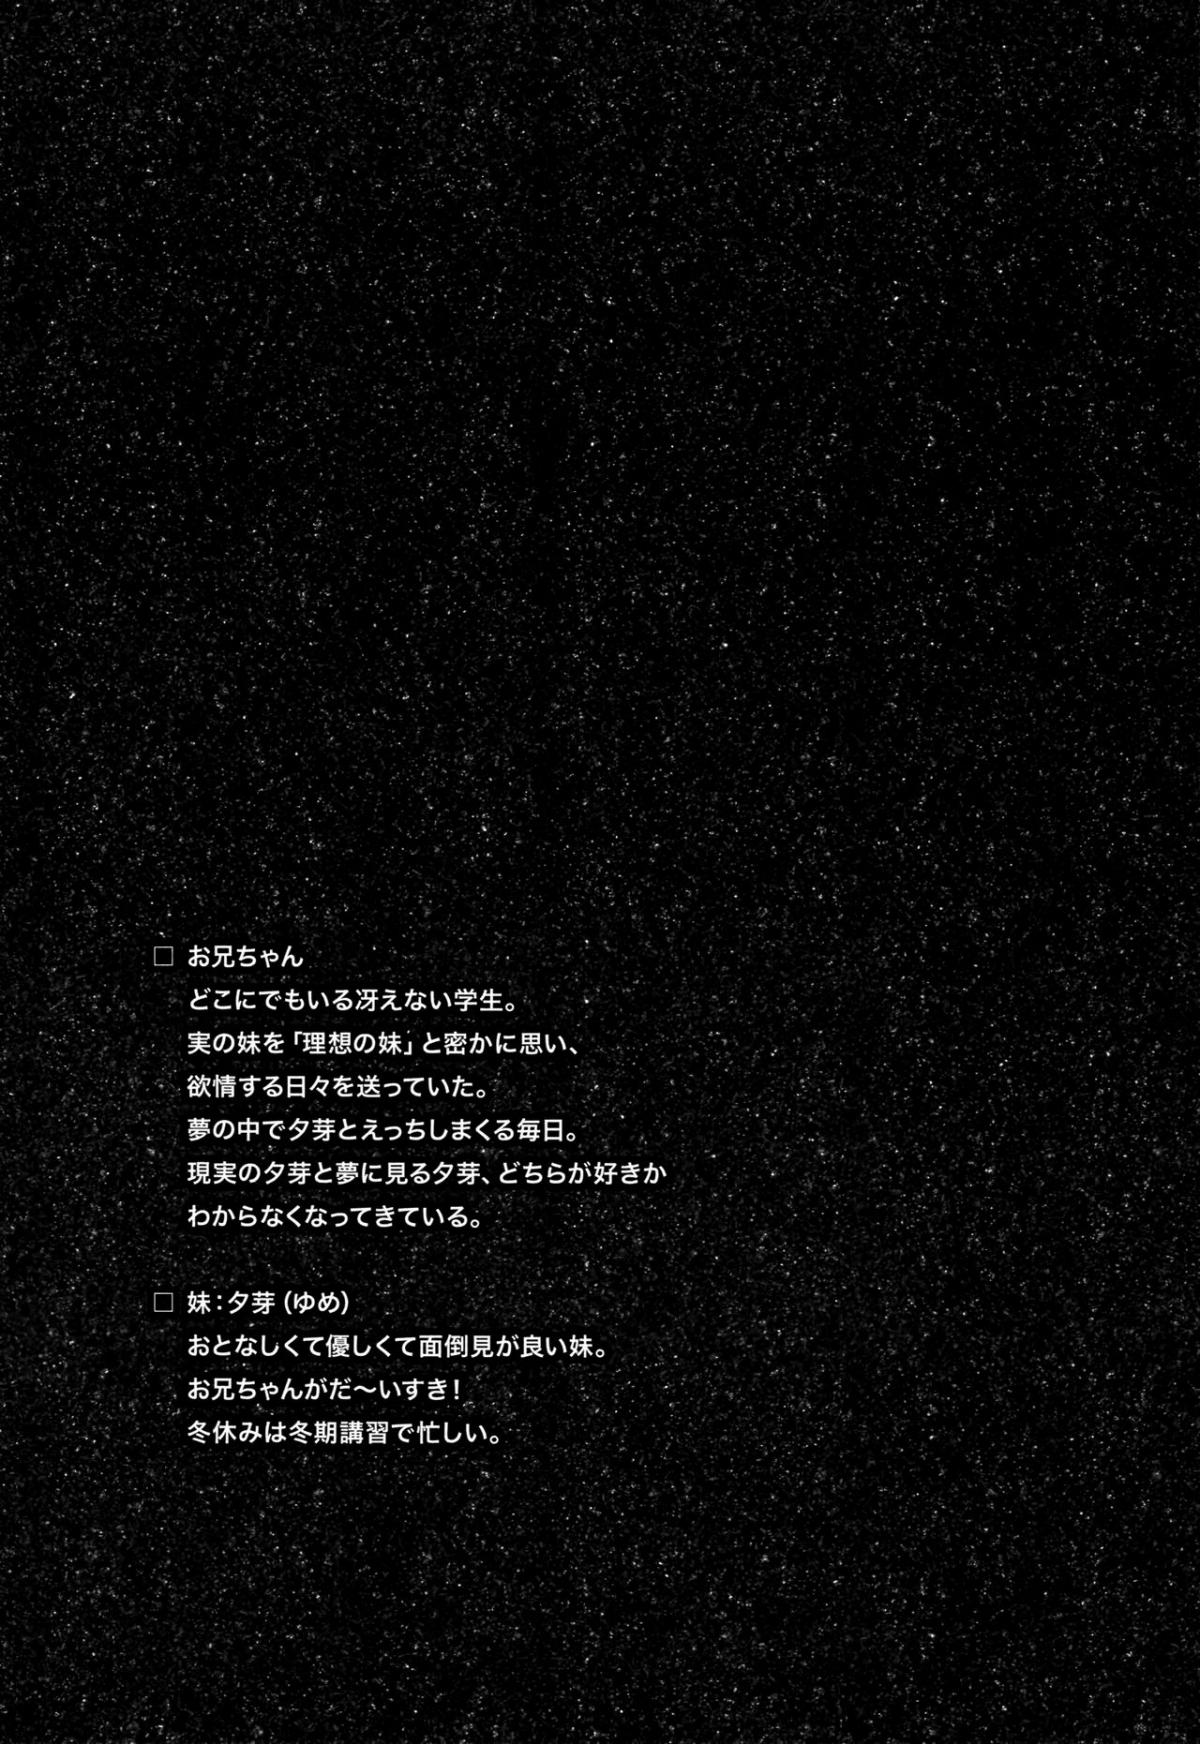 HentaiVN.net - Ảnh 4 - Risou no Imouto - Chap 6